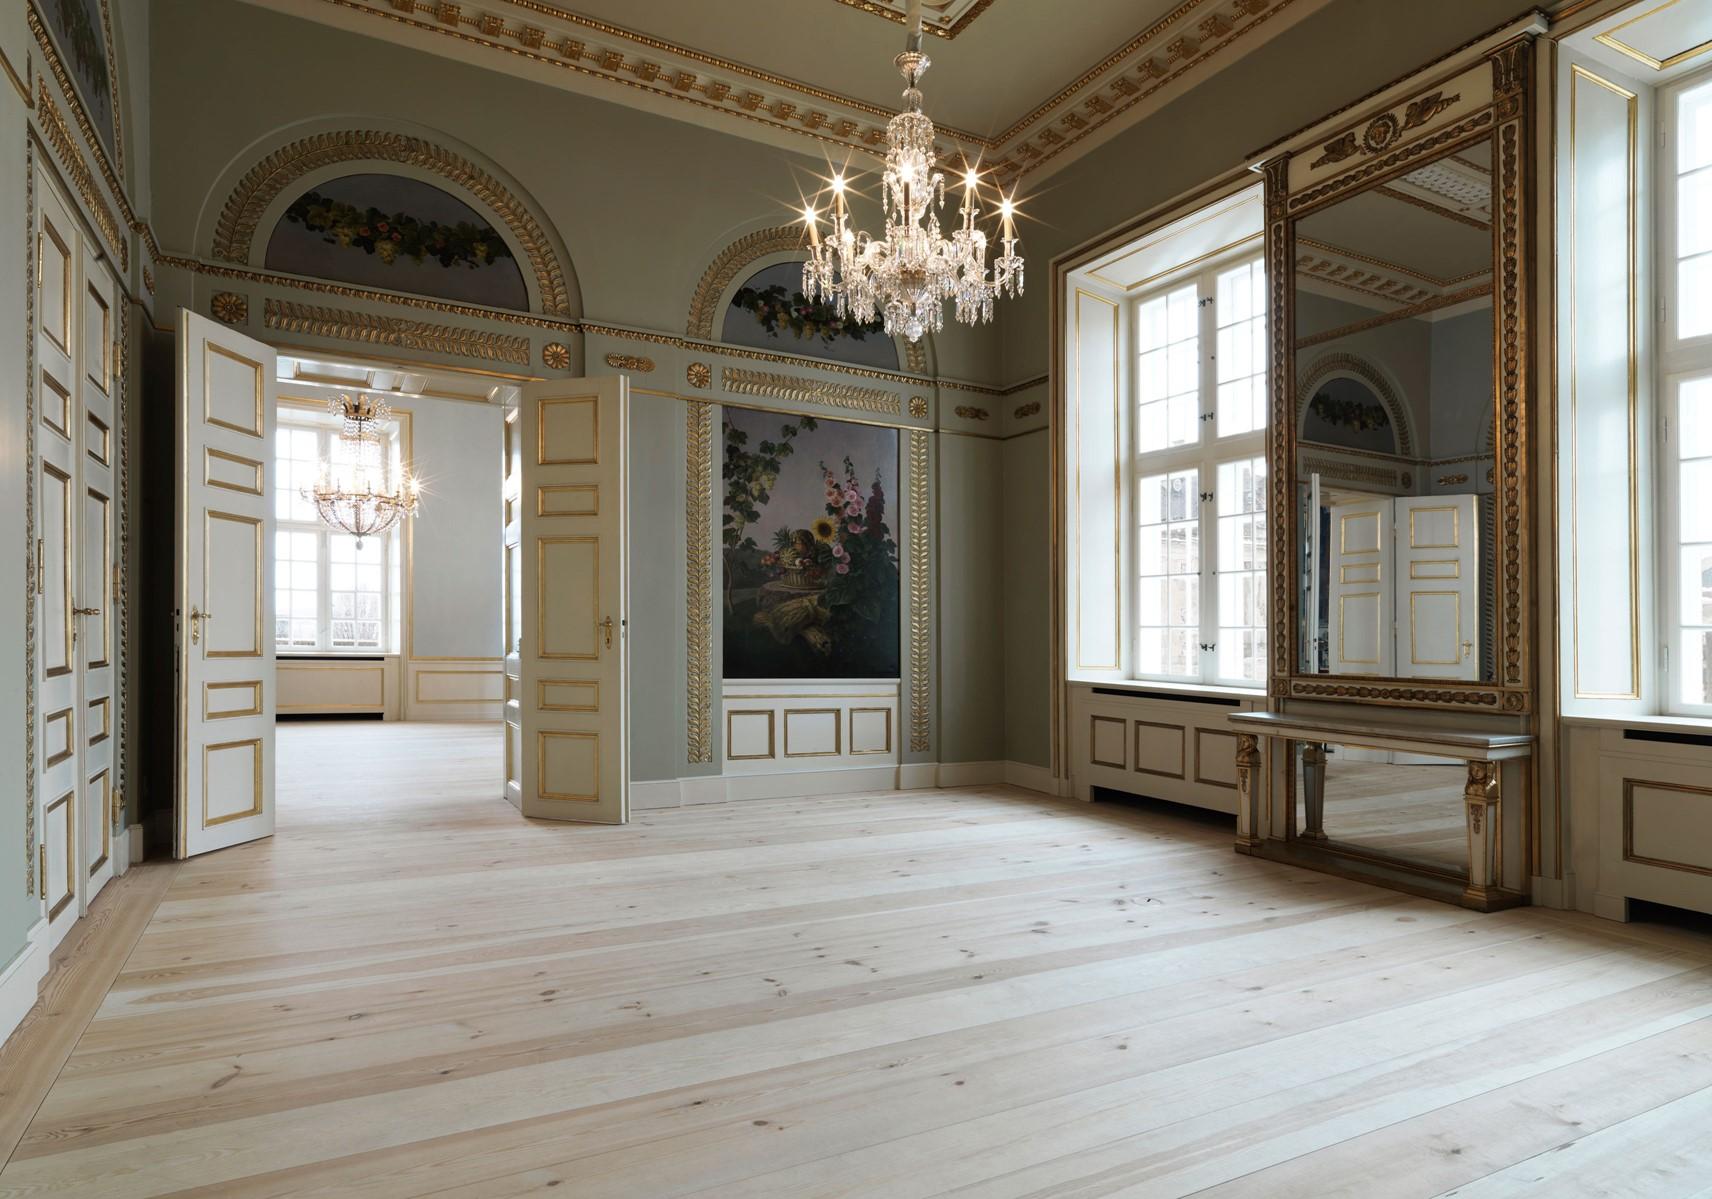 pine-floor-restoration_natural-soap_amailienborg-slot-copenhagen_dinesen.jpg